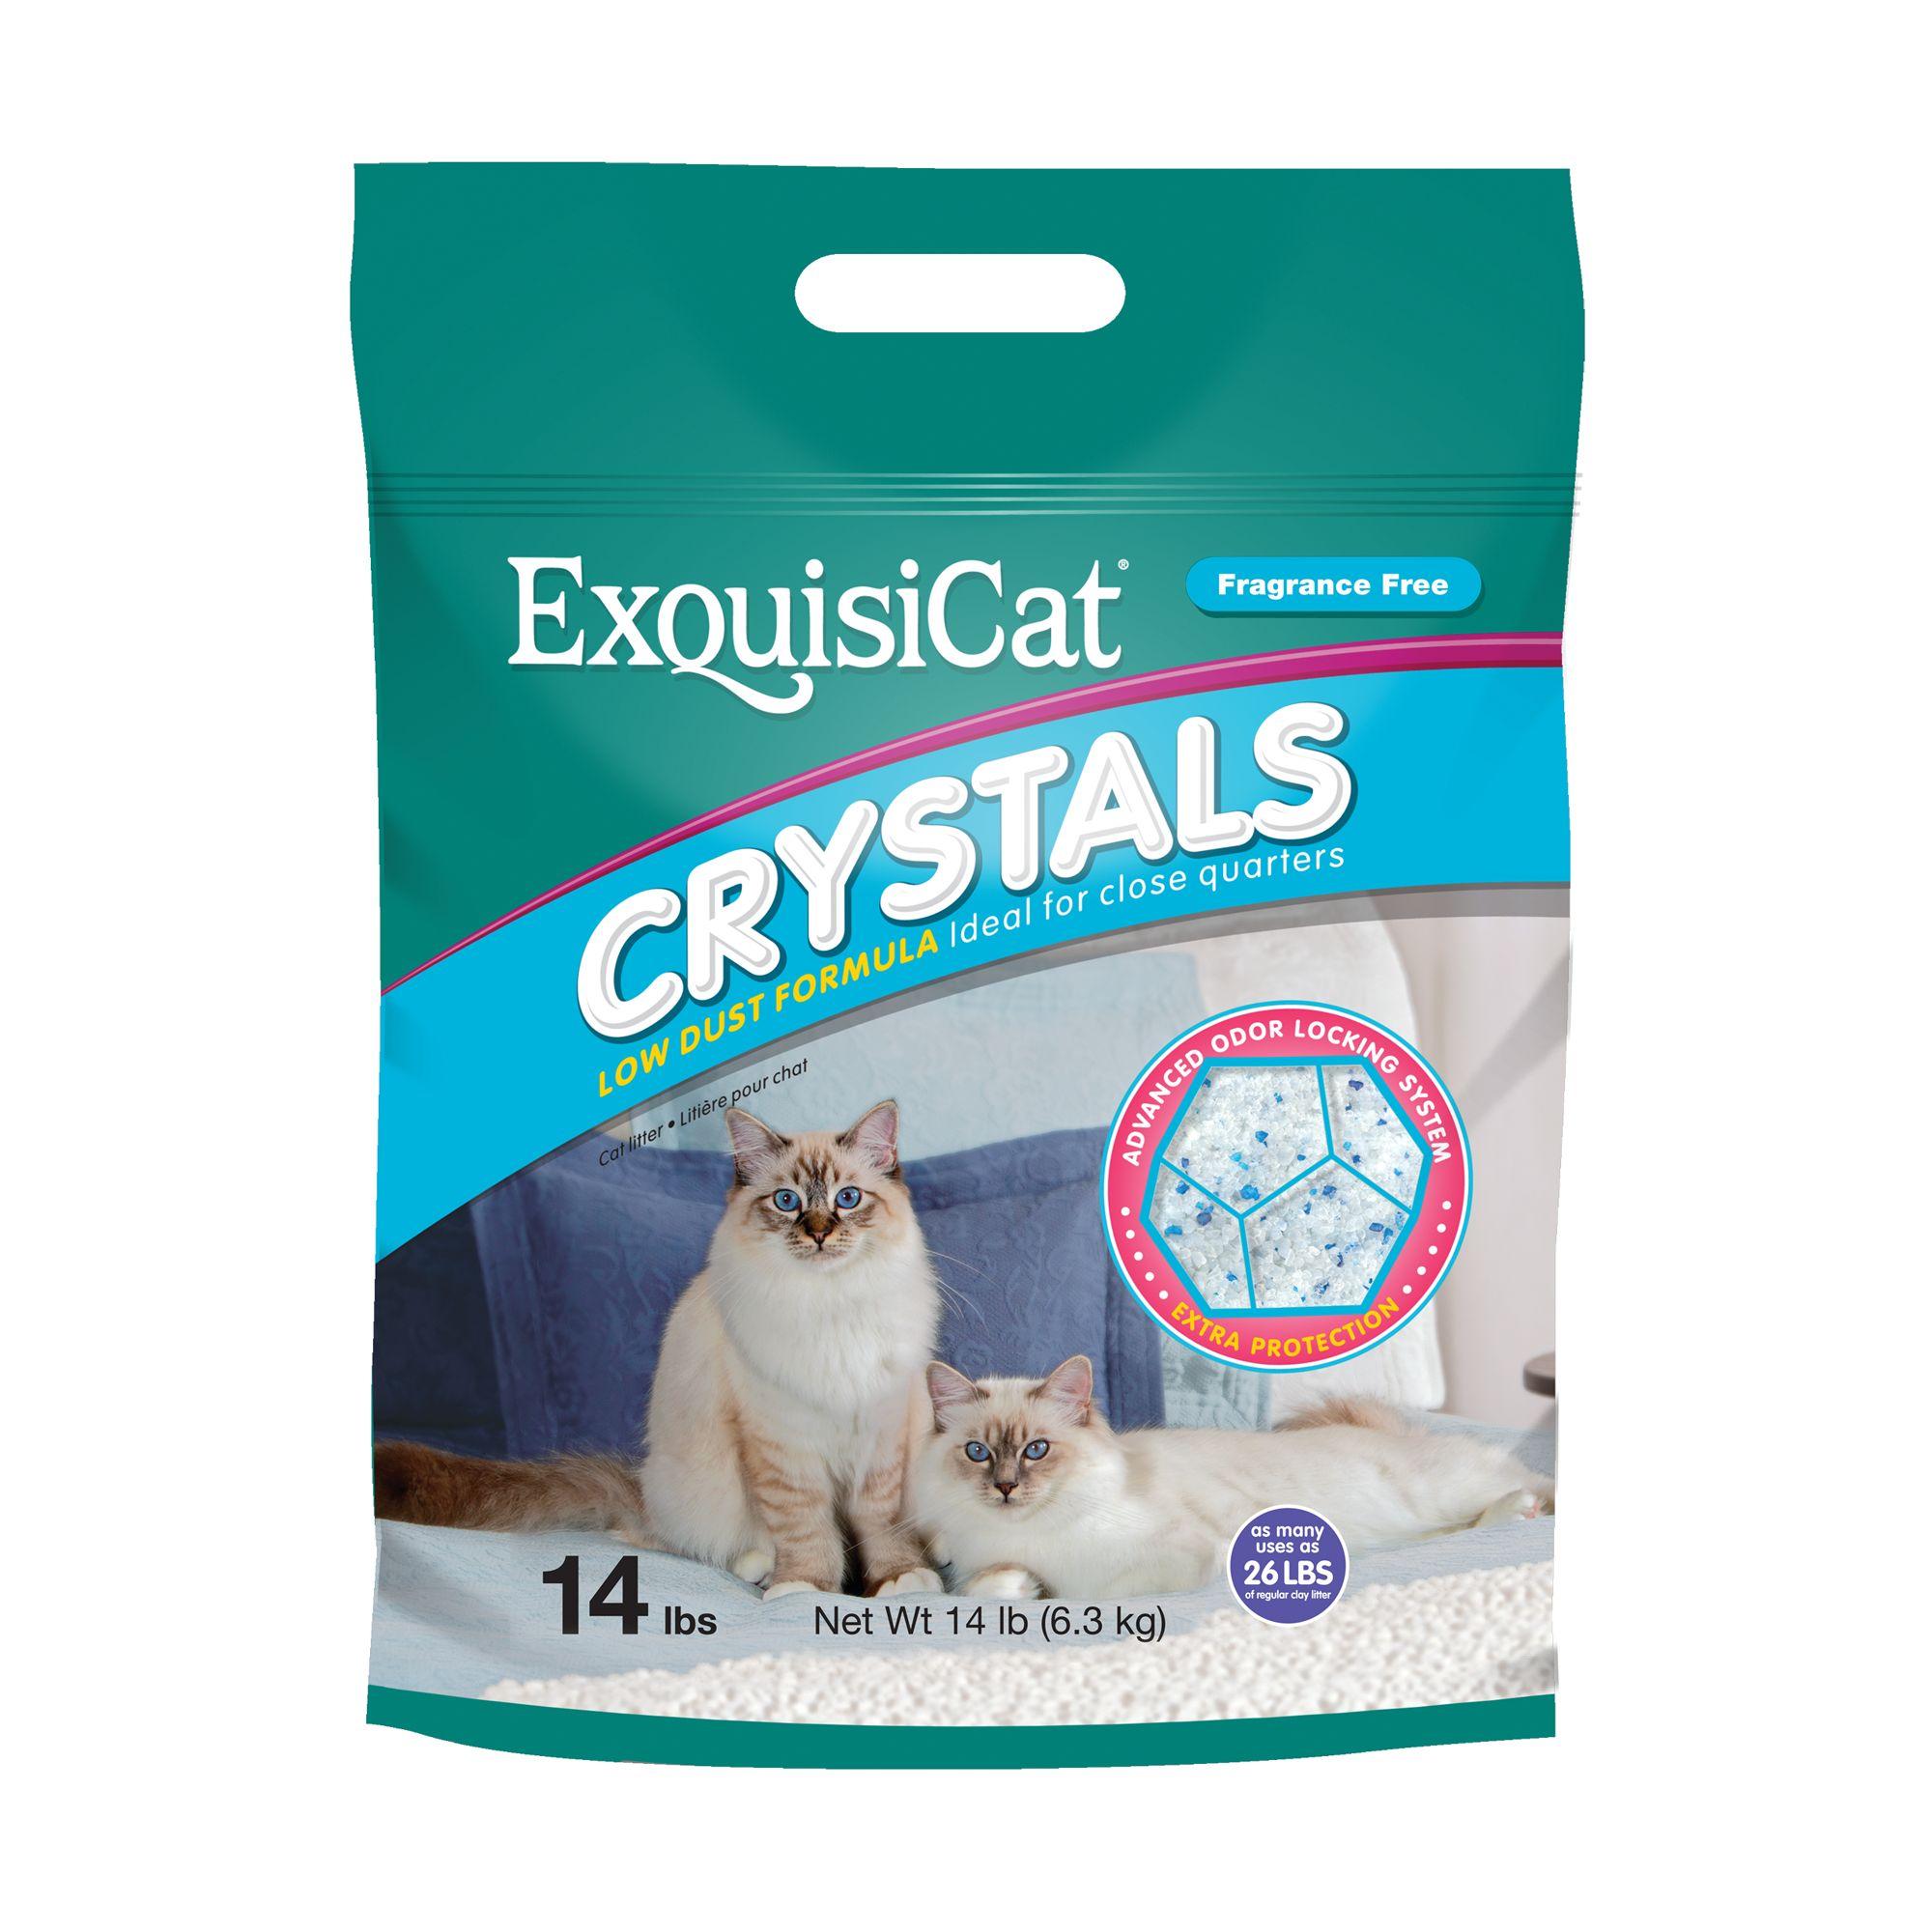 Exquisicat Crystals Low Dust Formula Fragrance Free Cat